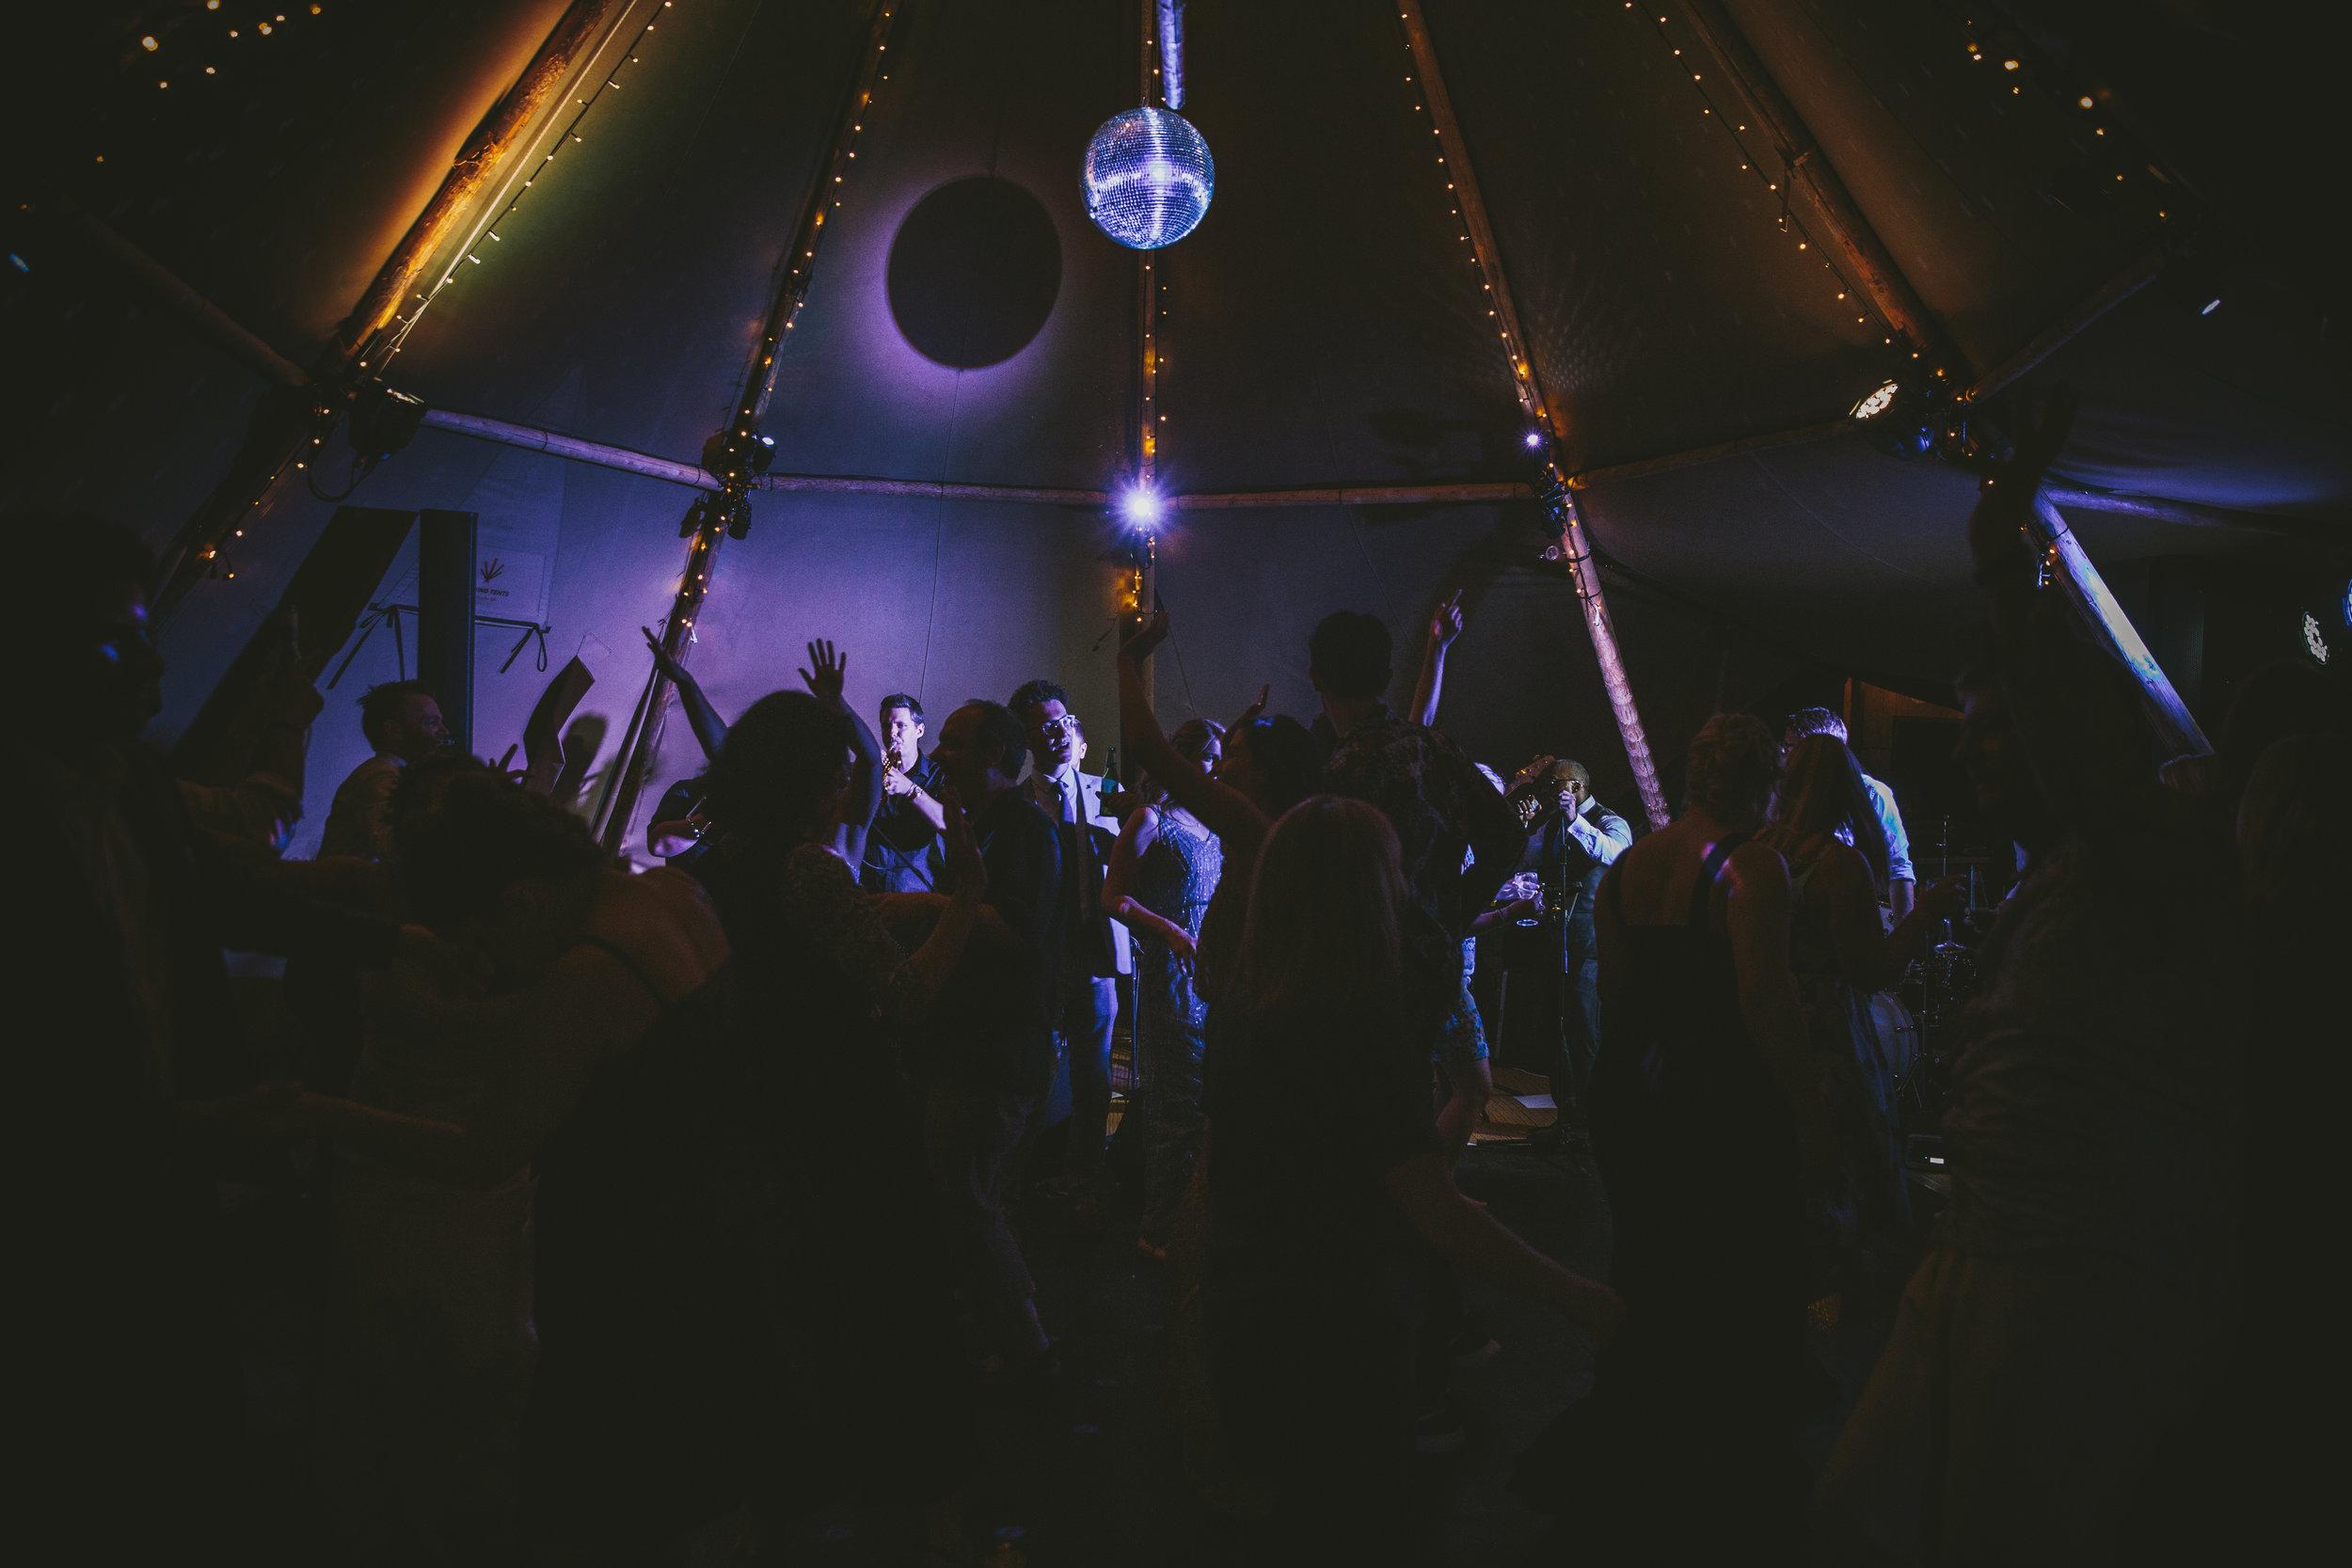 Coloured dance floor lights & mirror ball